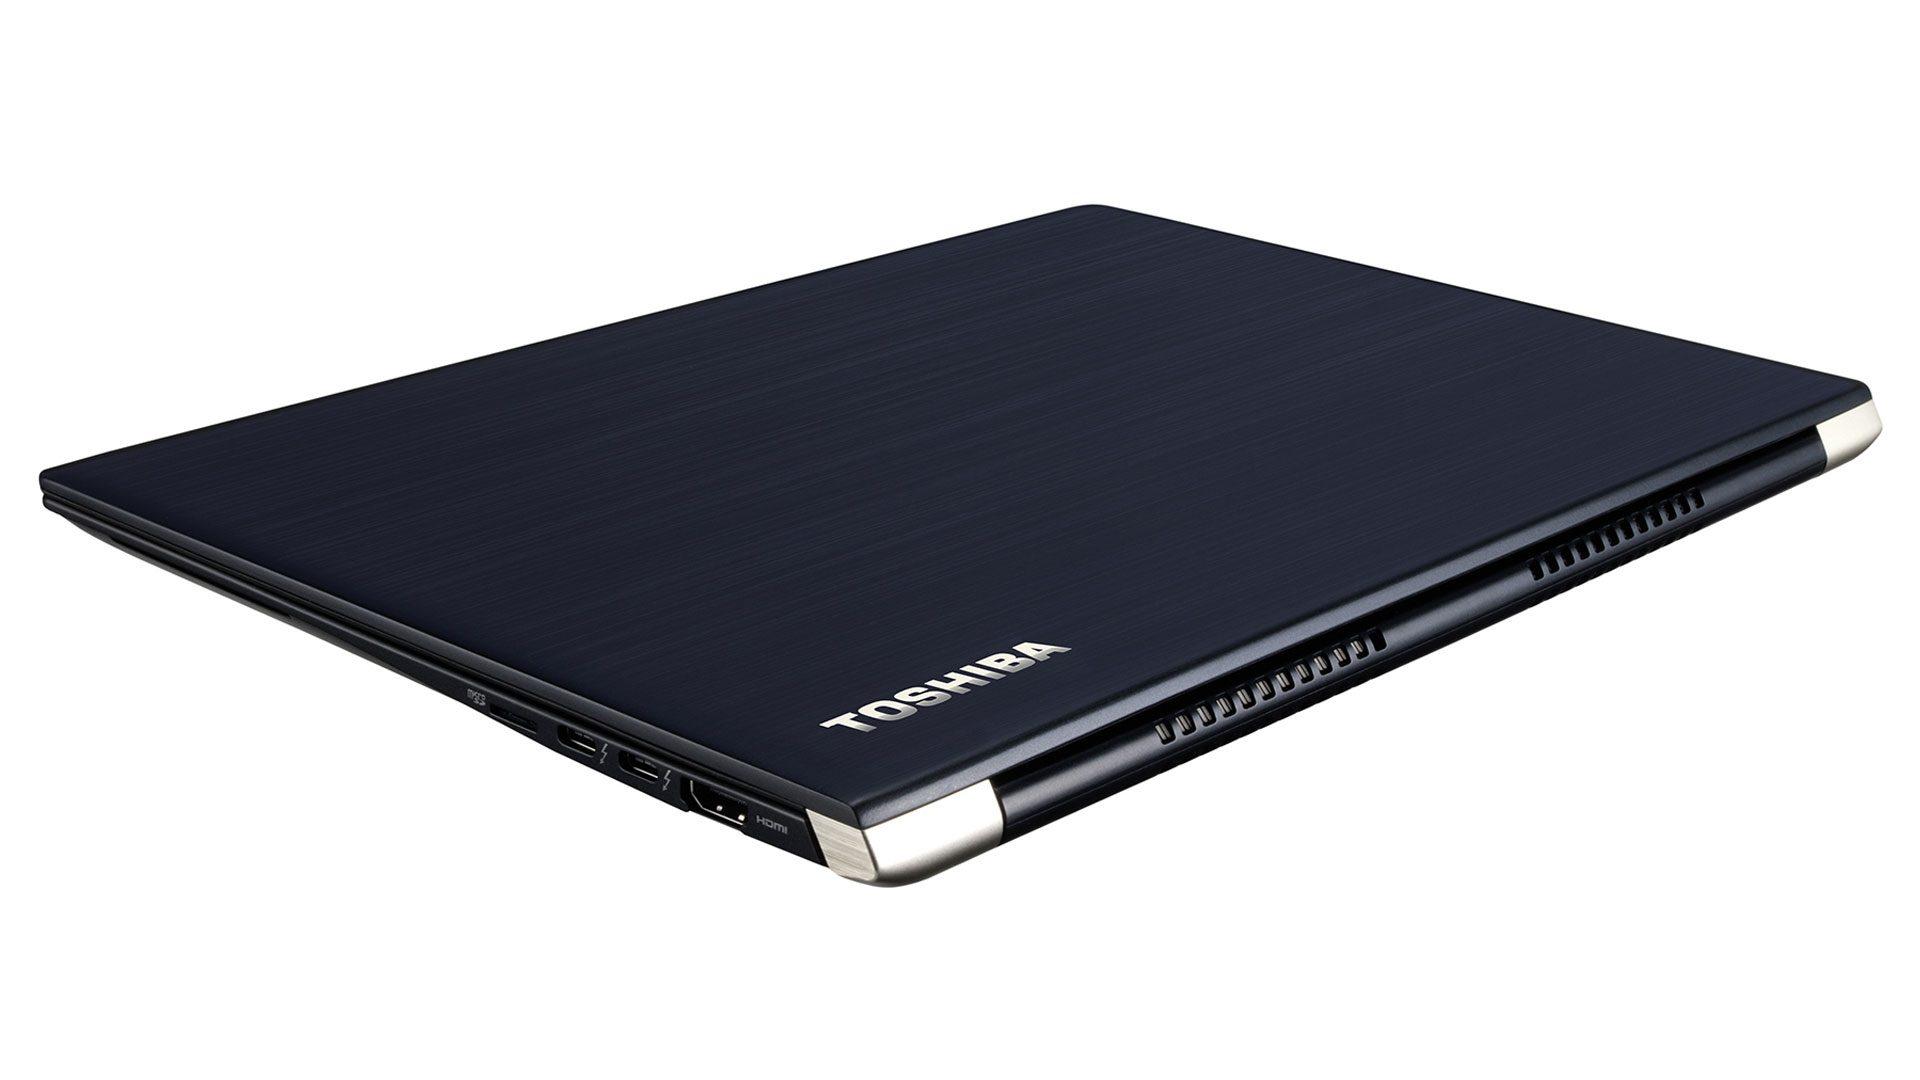 Toshiba-Tecra-x40-D-11F_Ansicht-5